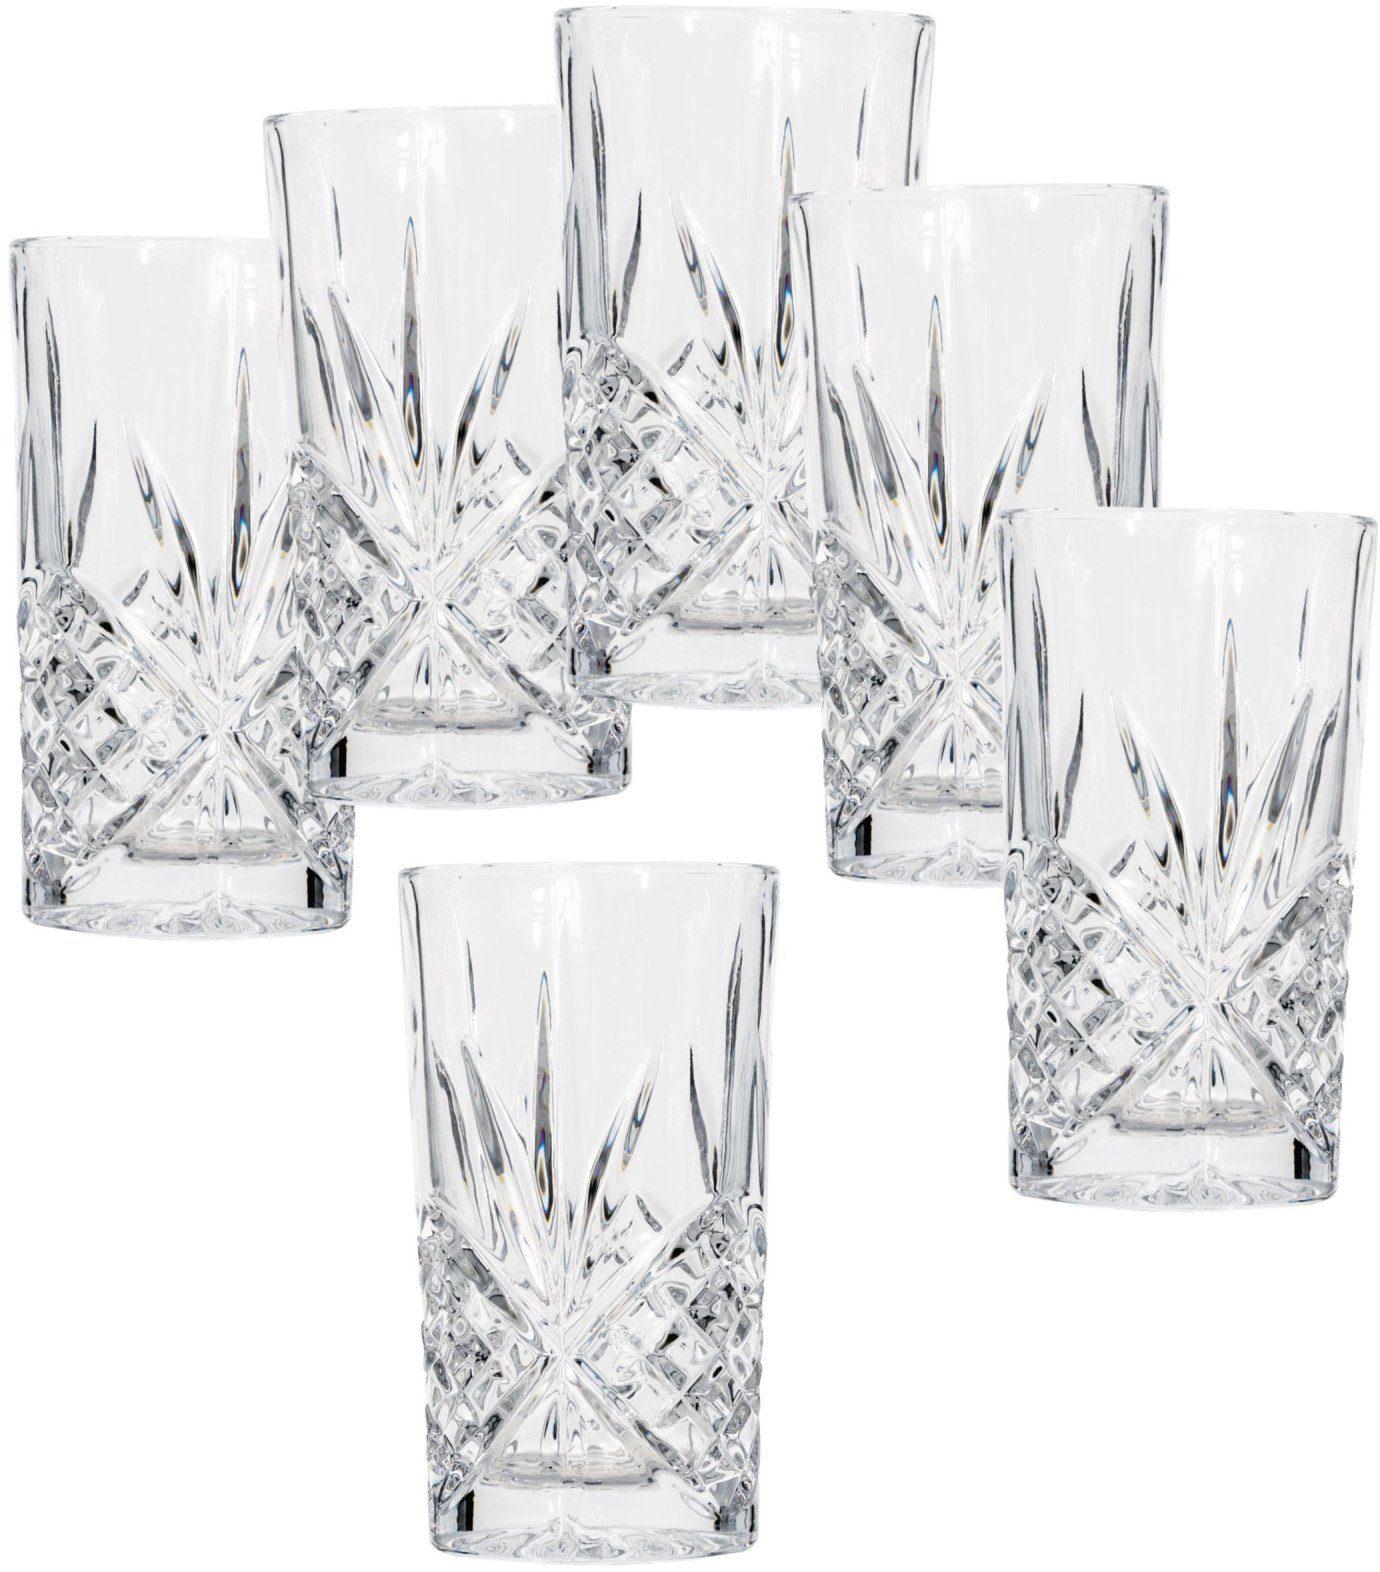 Mailord Gläser-Set, 6-teilig